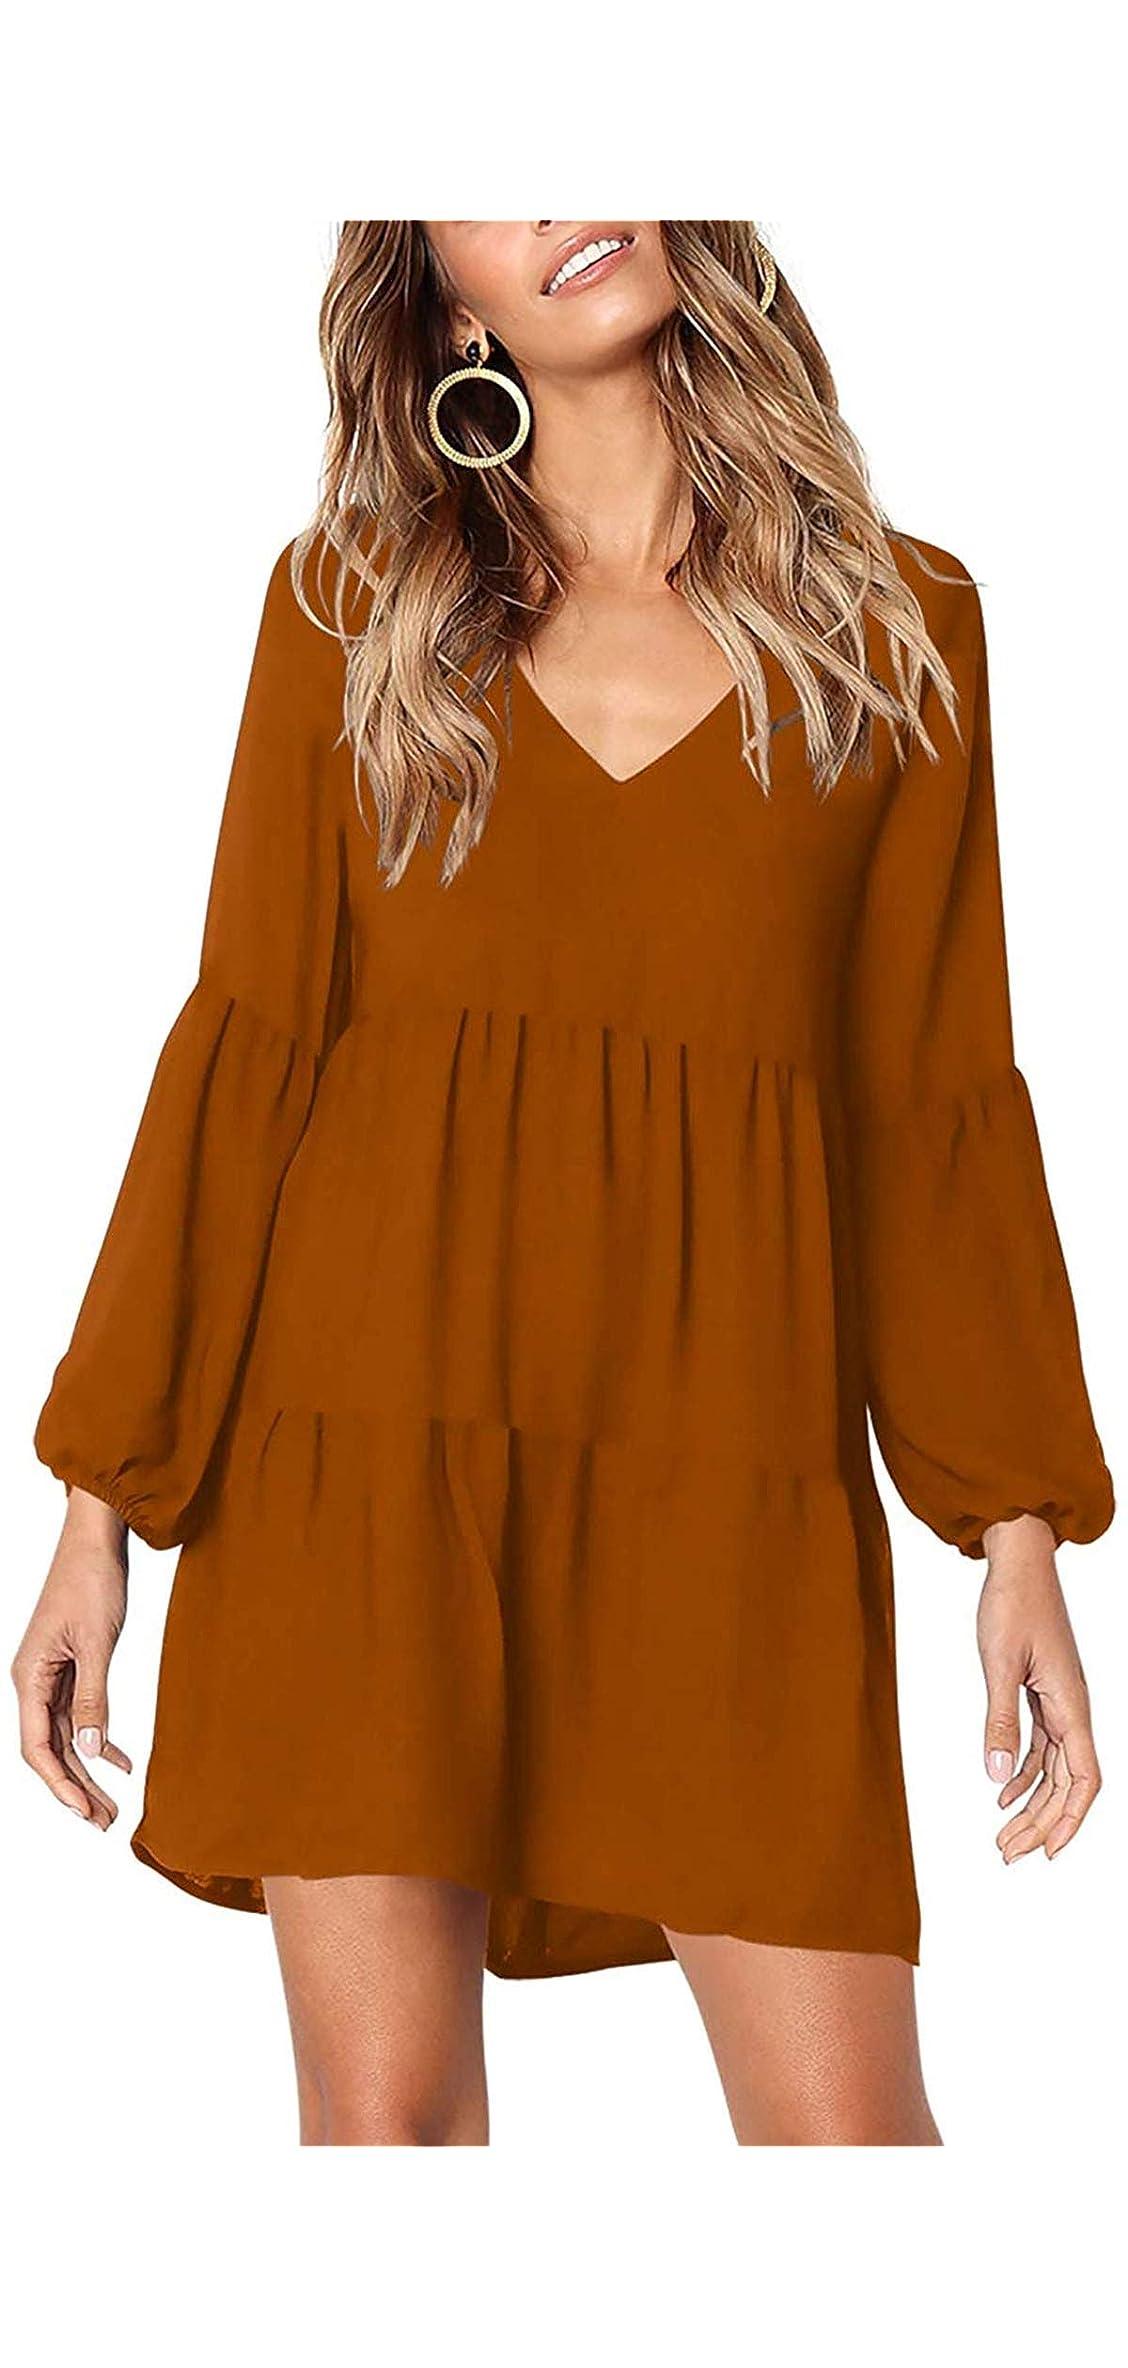 Women's Short Sleeve Tunic Dress V Neck Ruffle Loose